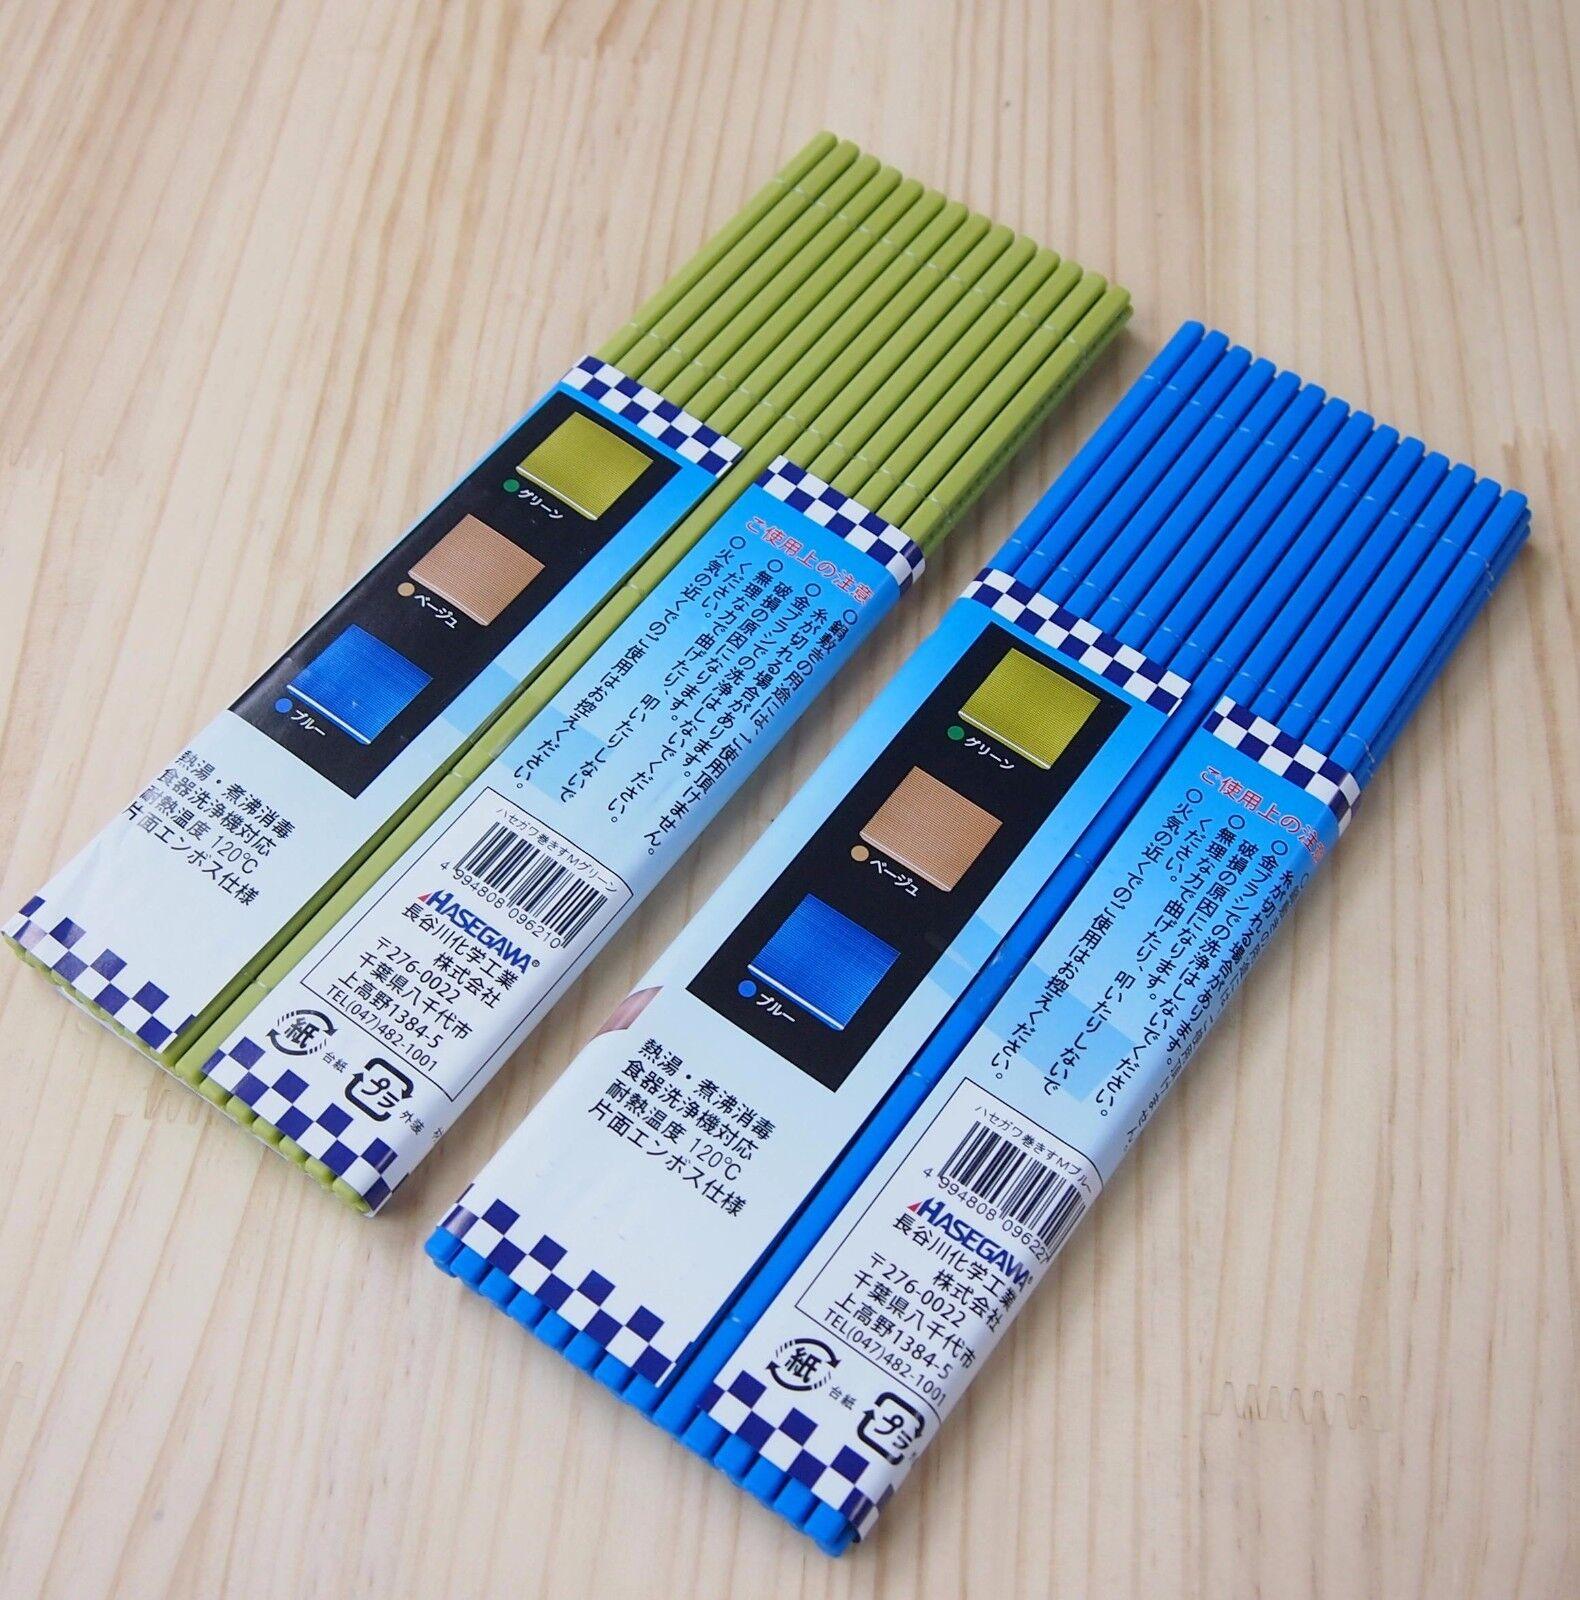 HASEGAWA Makisu - 2 Units of Plastic Professional Sushi Rolling Mat (Sudare)